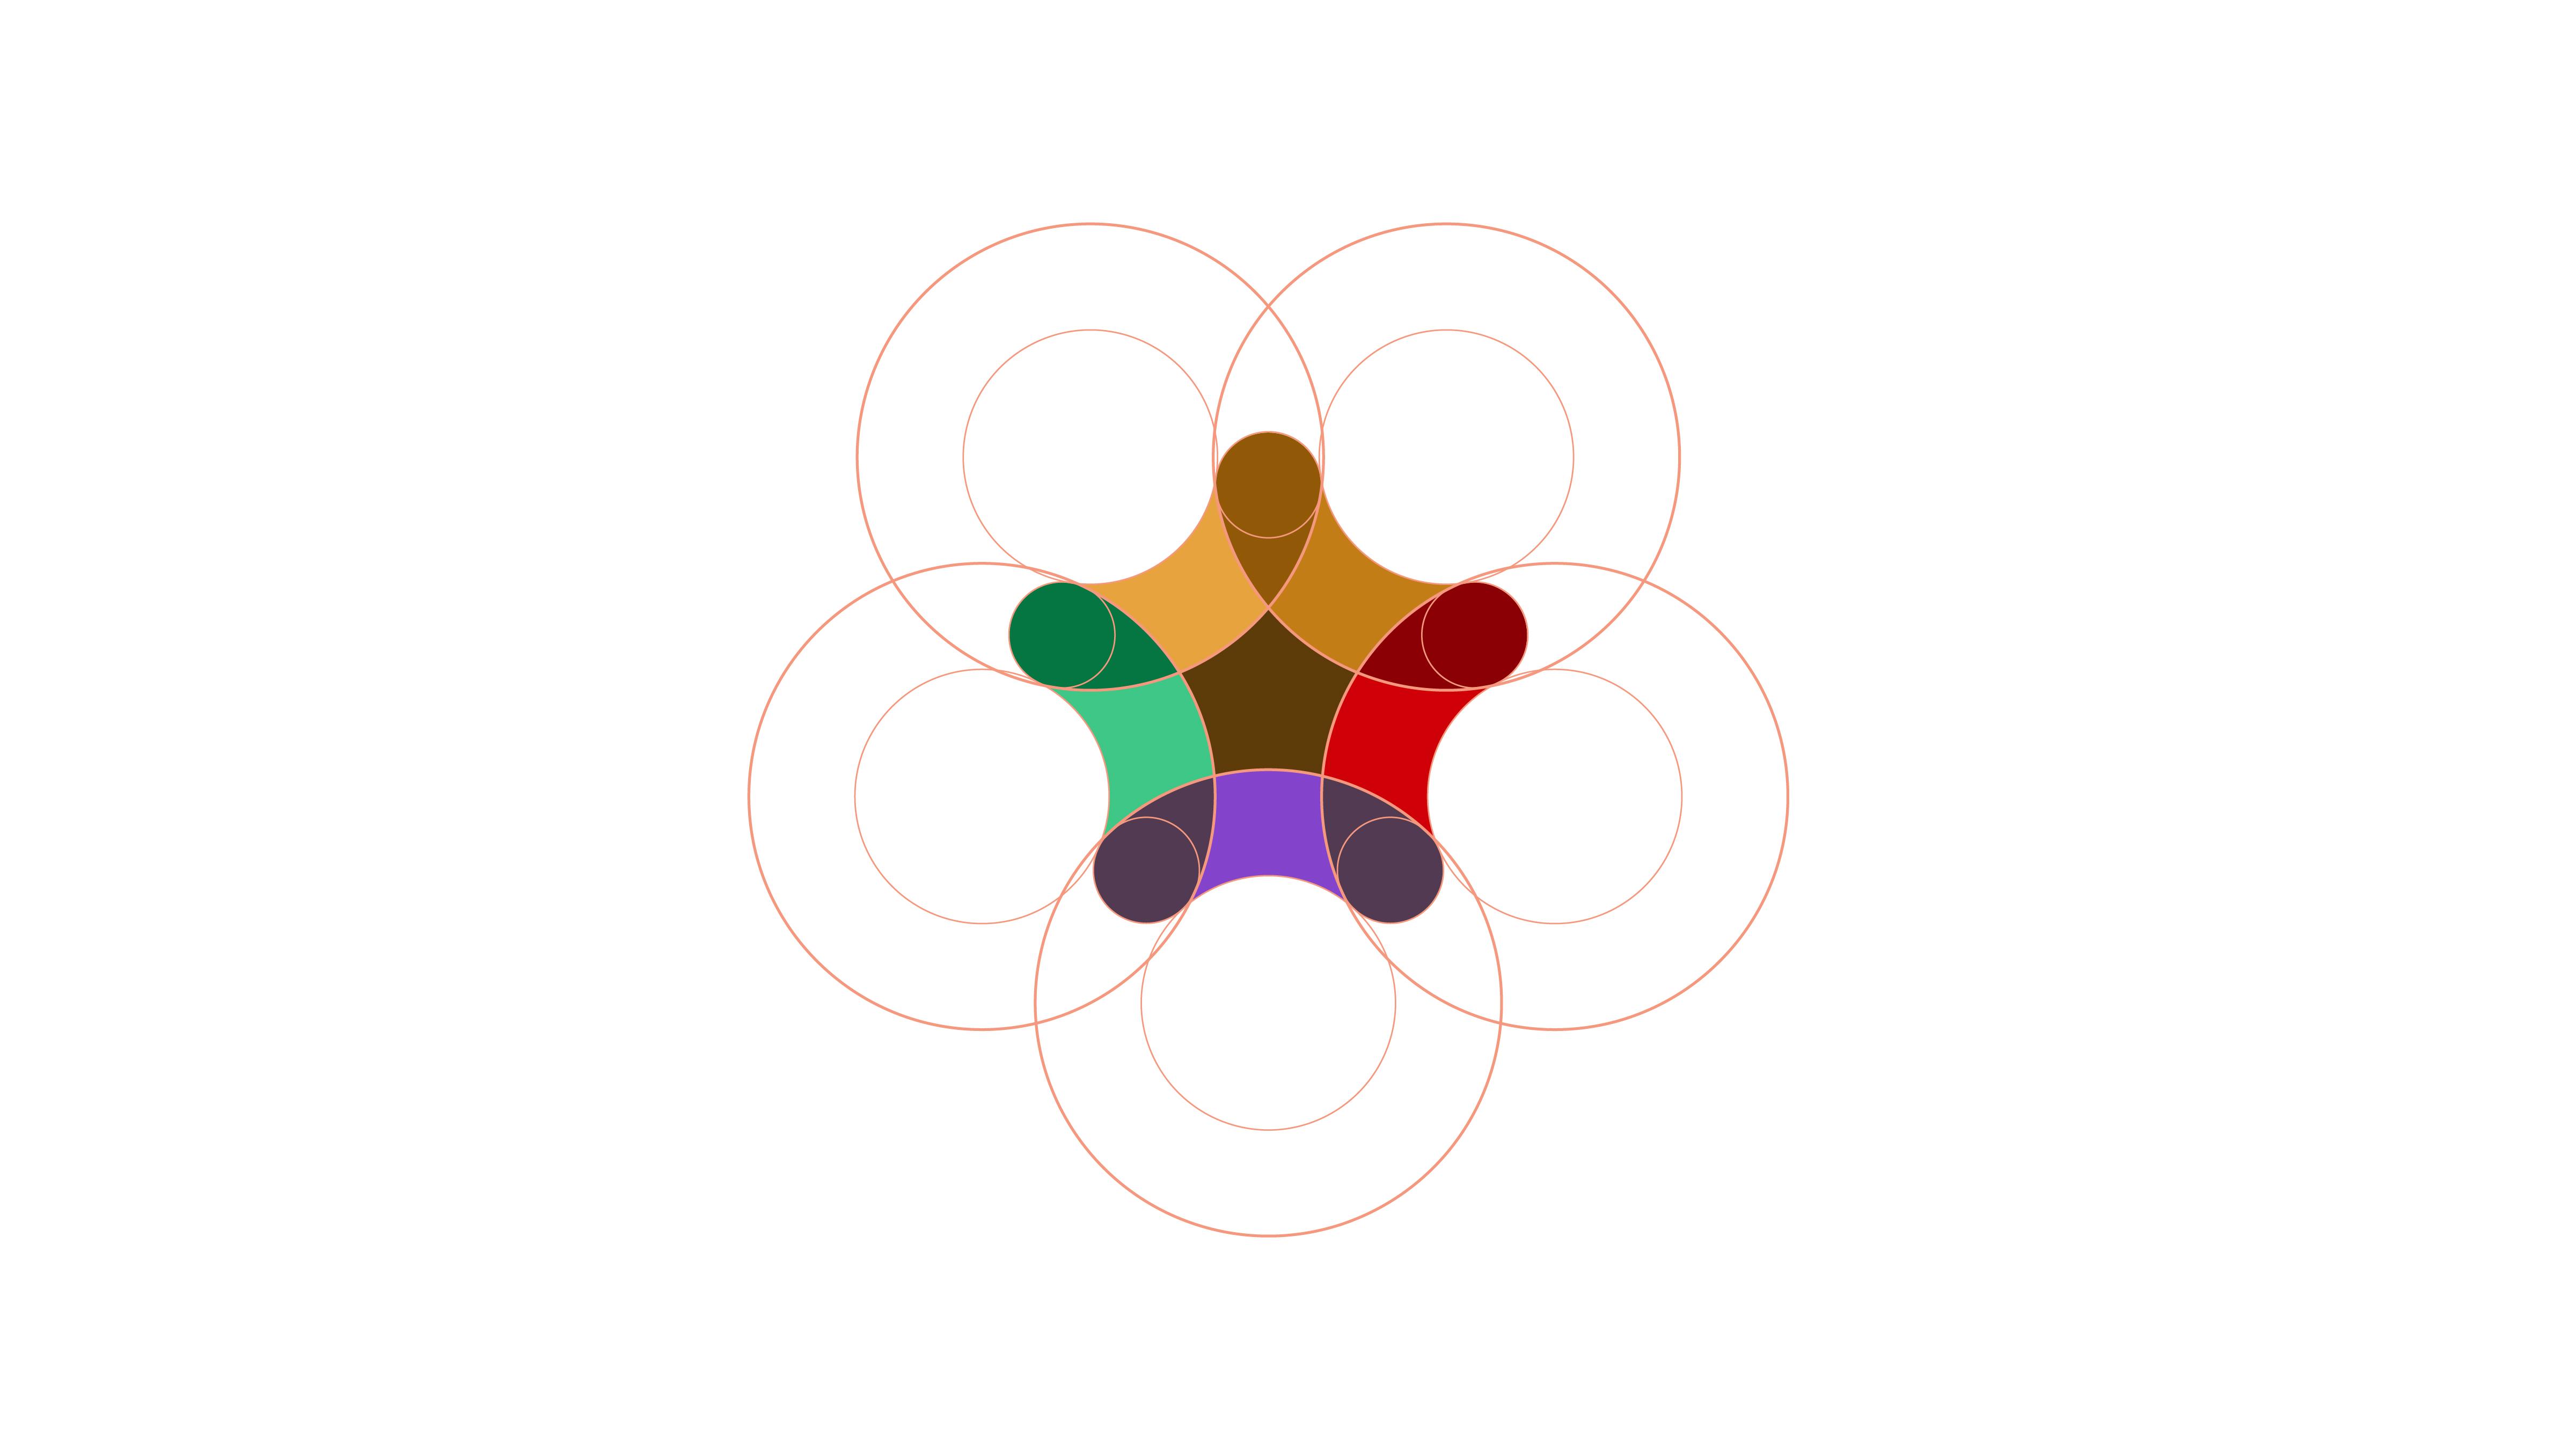 LinkedIn Employee Resource Group Black Inclusion Group logo design